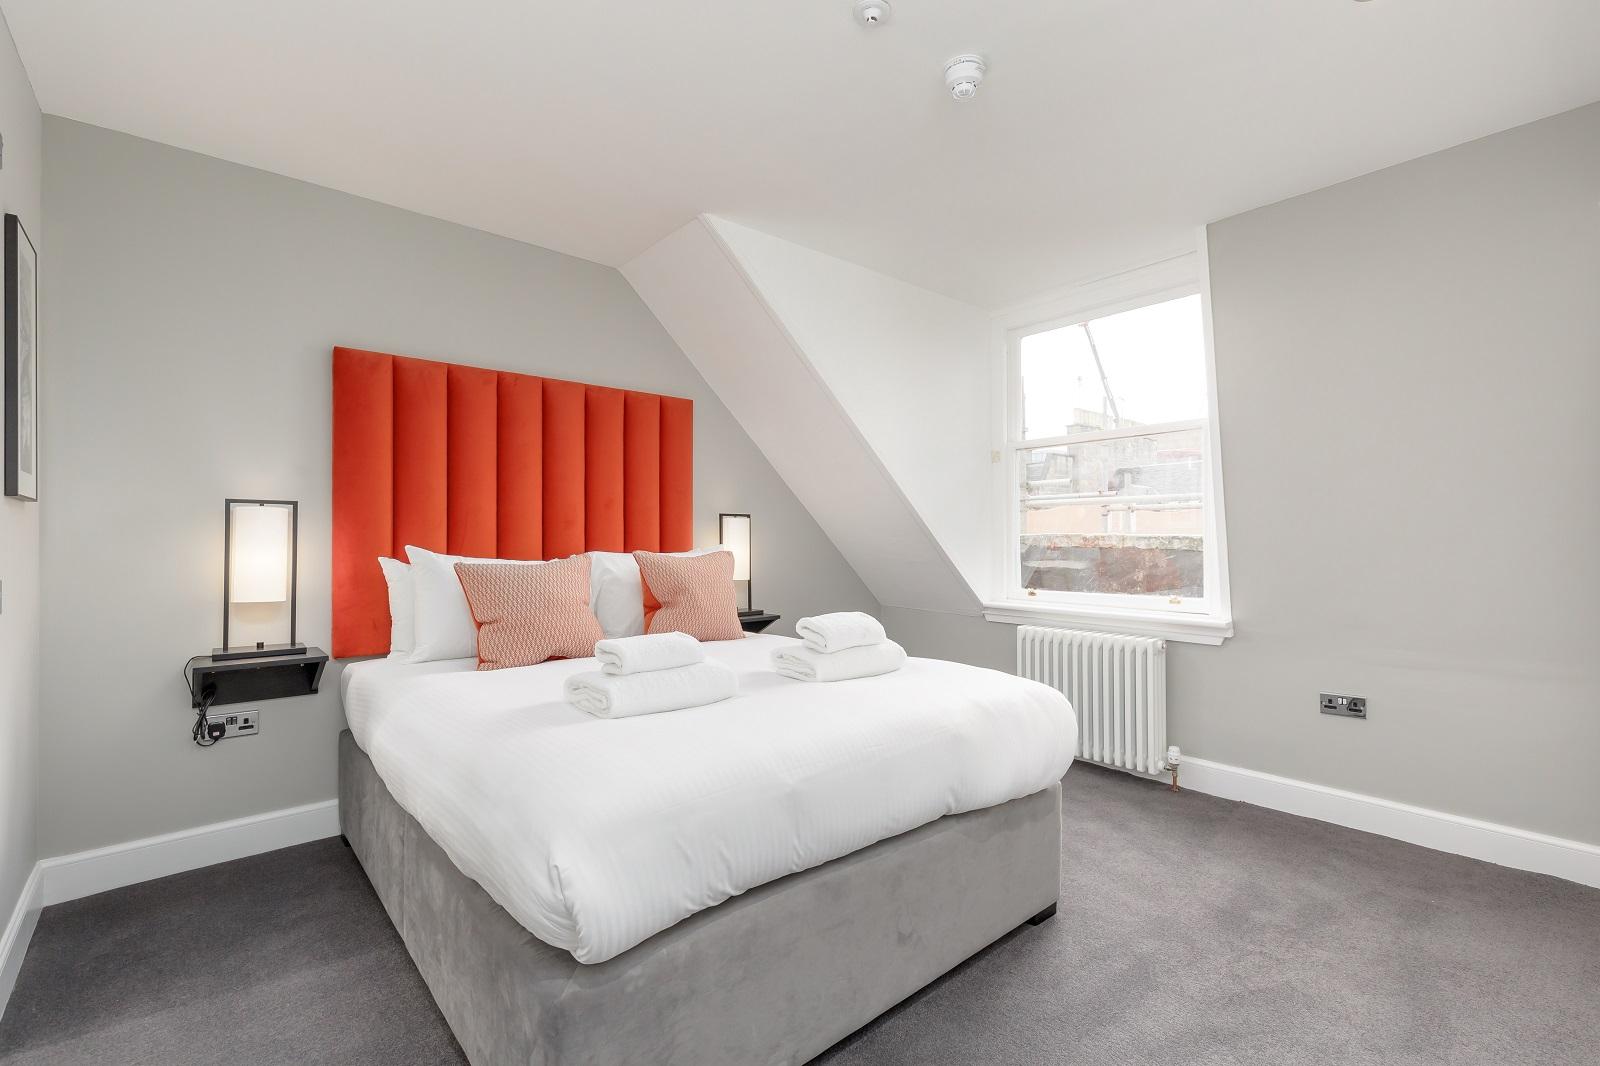 Bedroom at Hanover Serviced Apartments